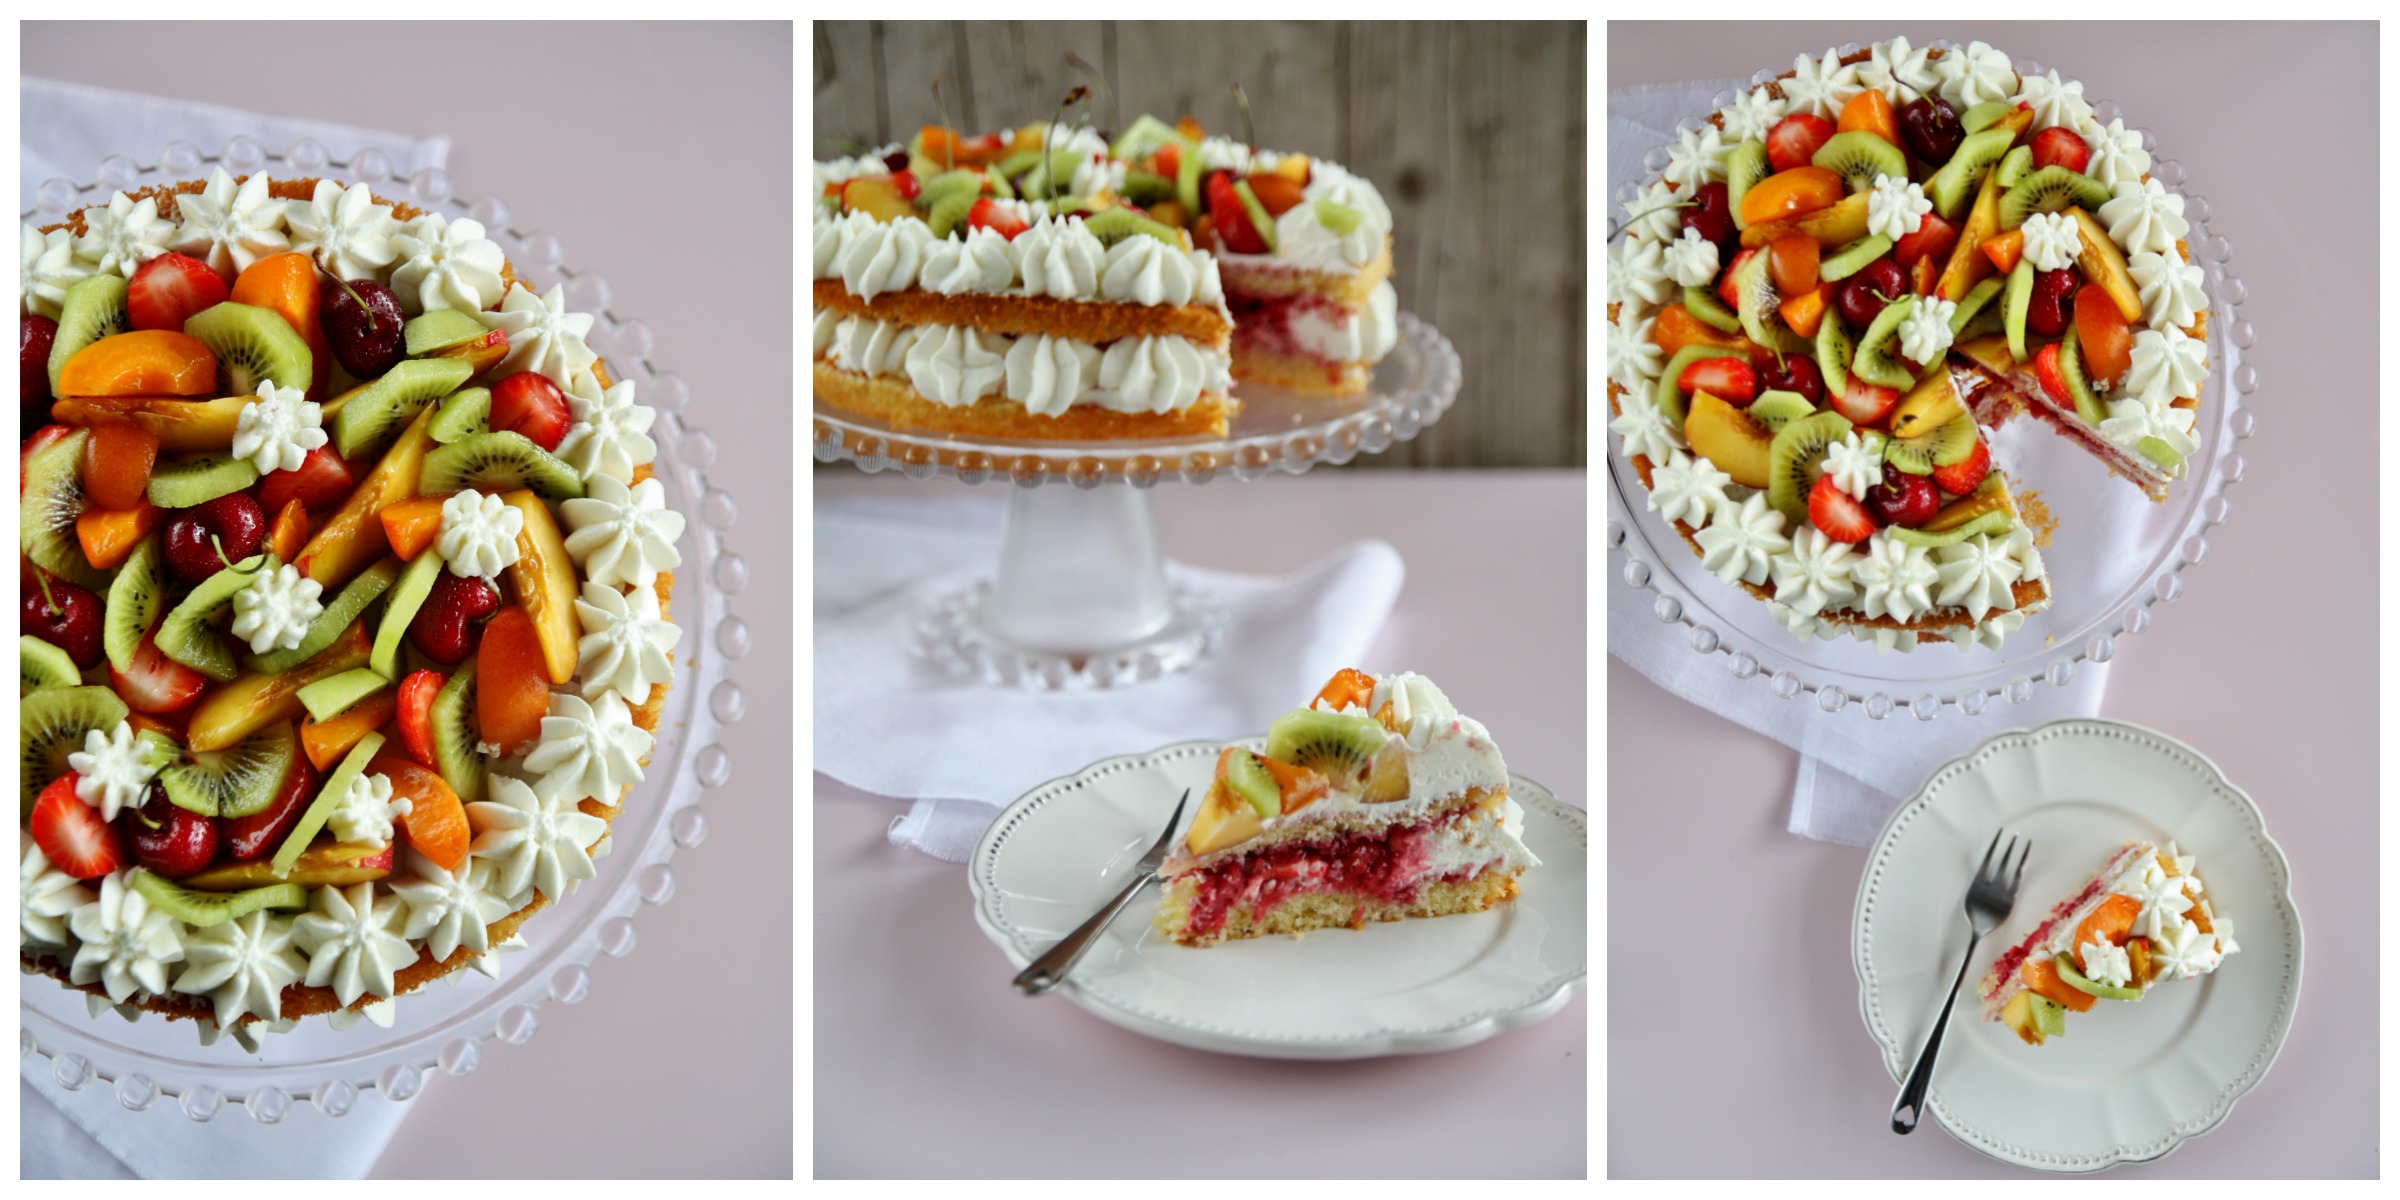 Naked cake Collage